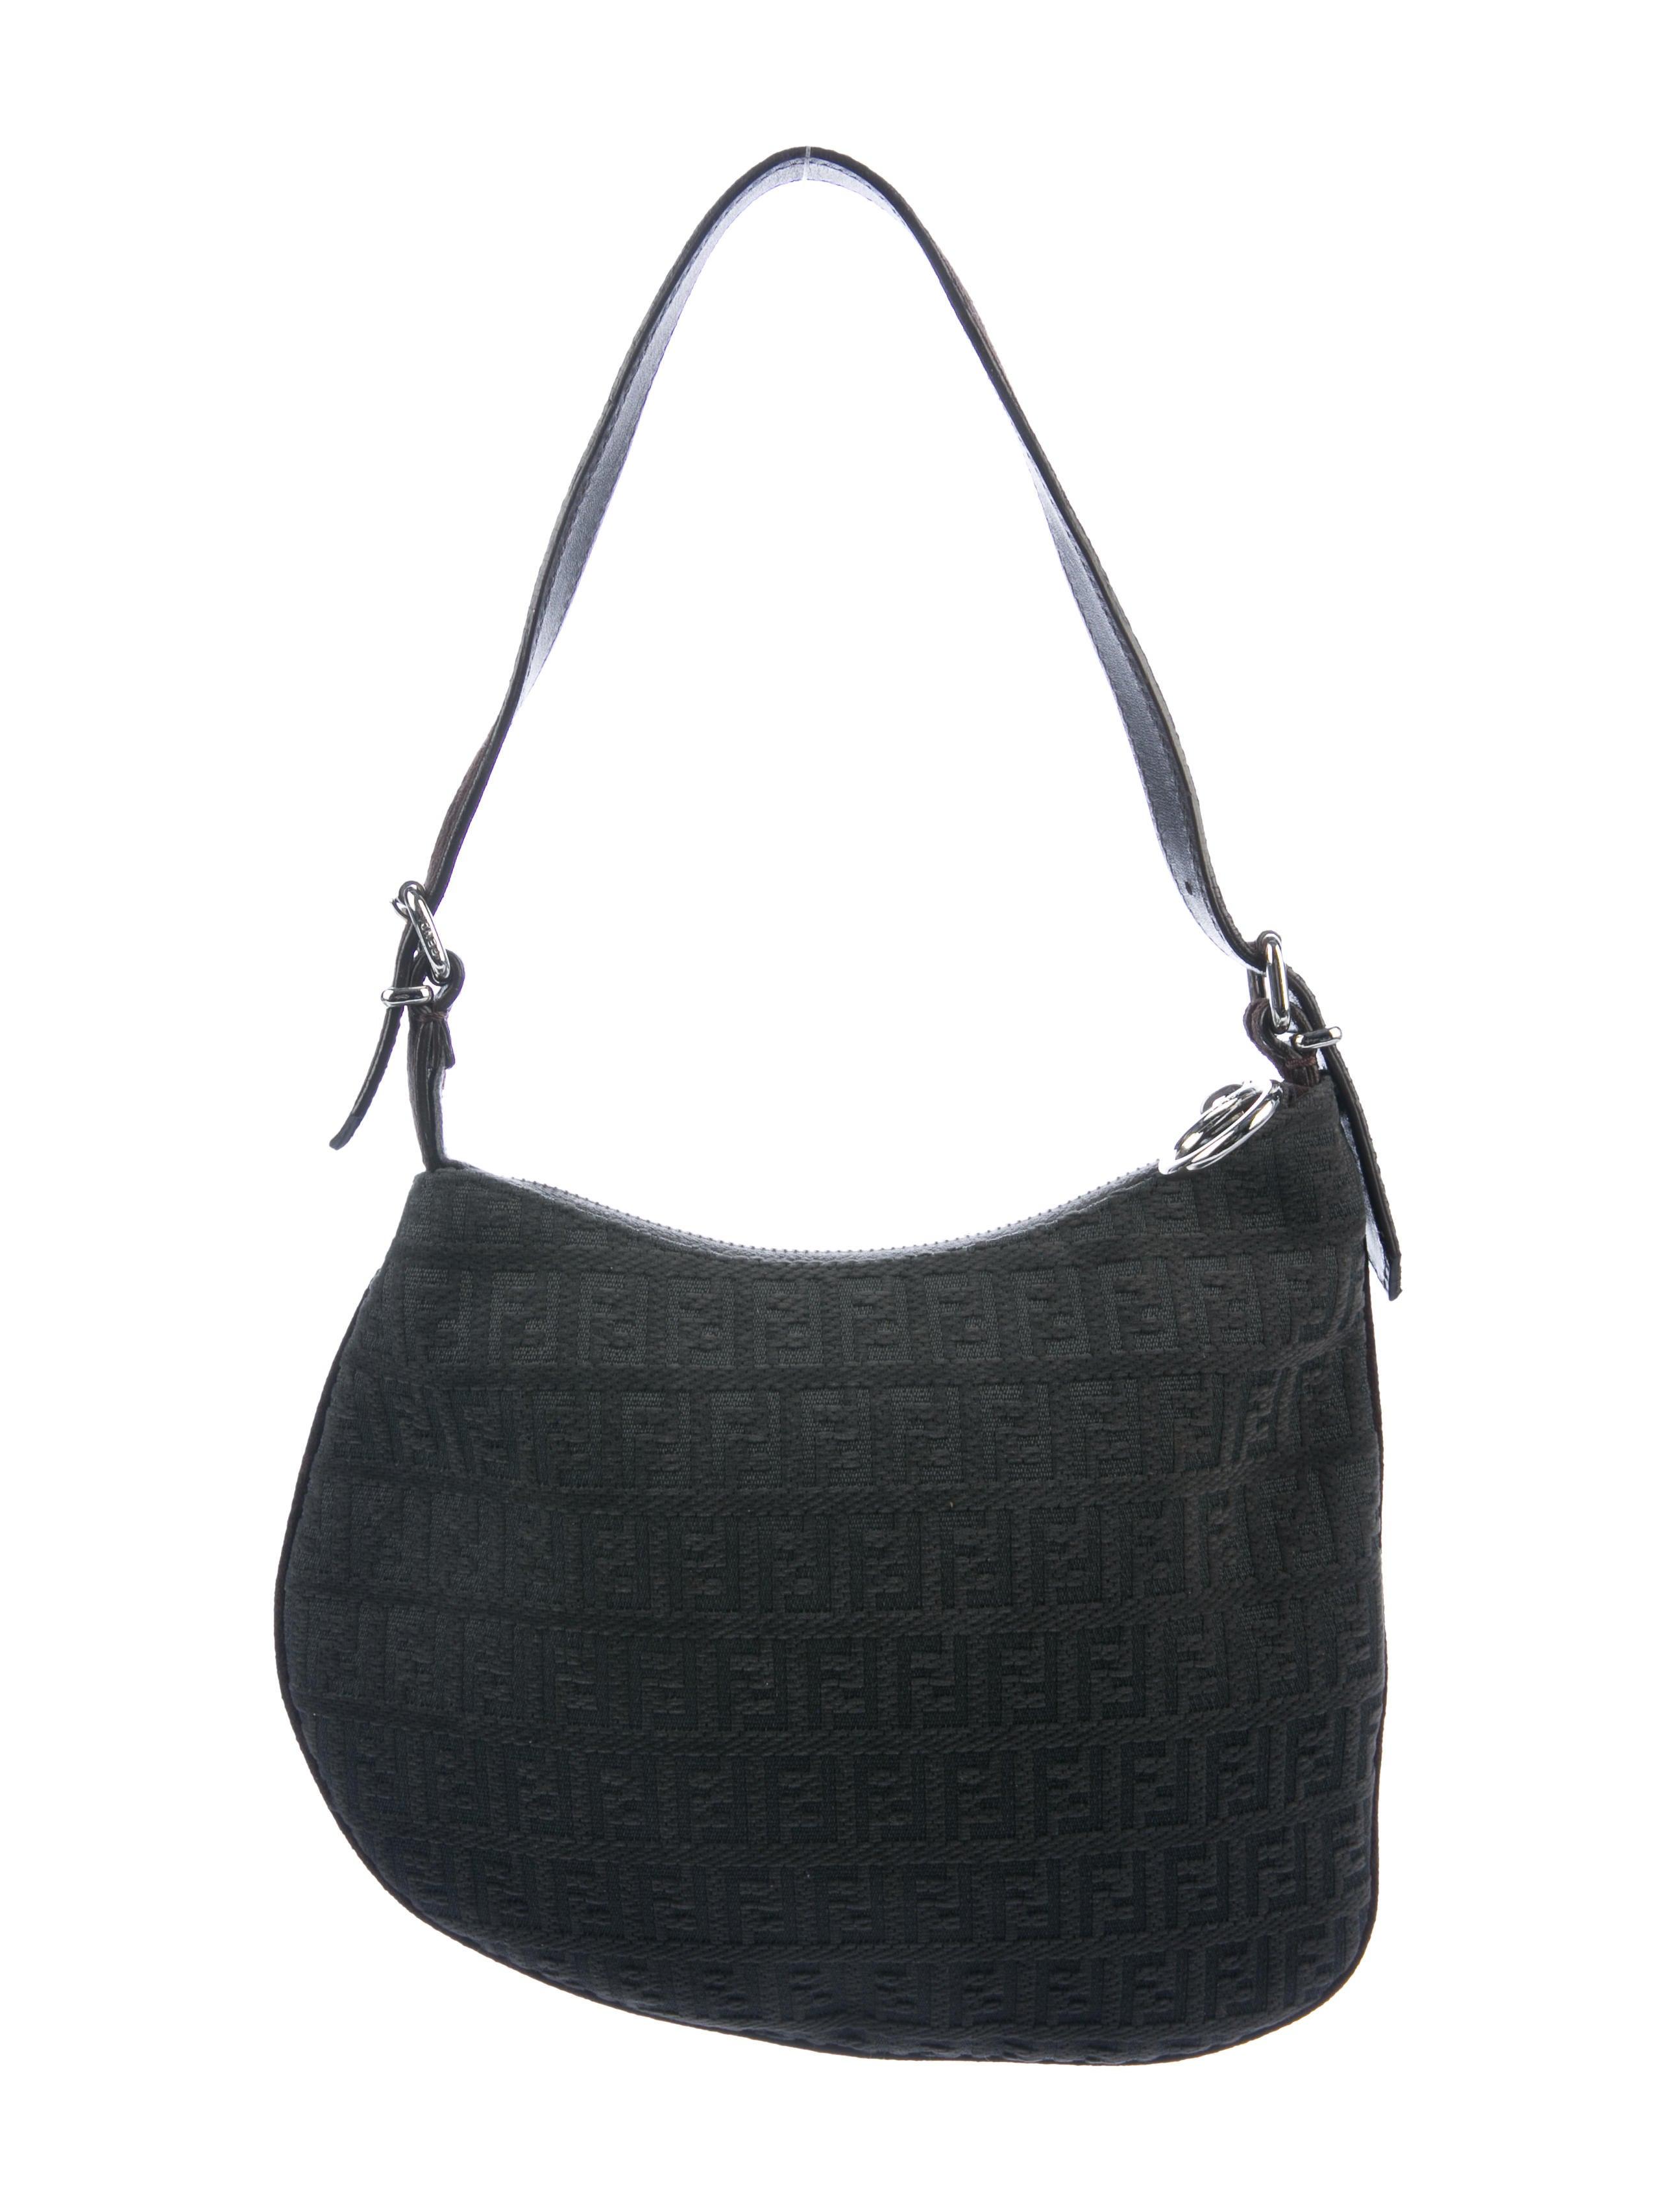 14344e3bb4b3 Fendi Zucchino Oyster Bag - Handbags - FEN101688